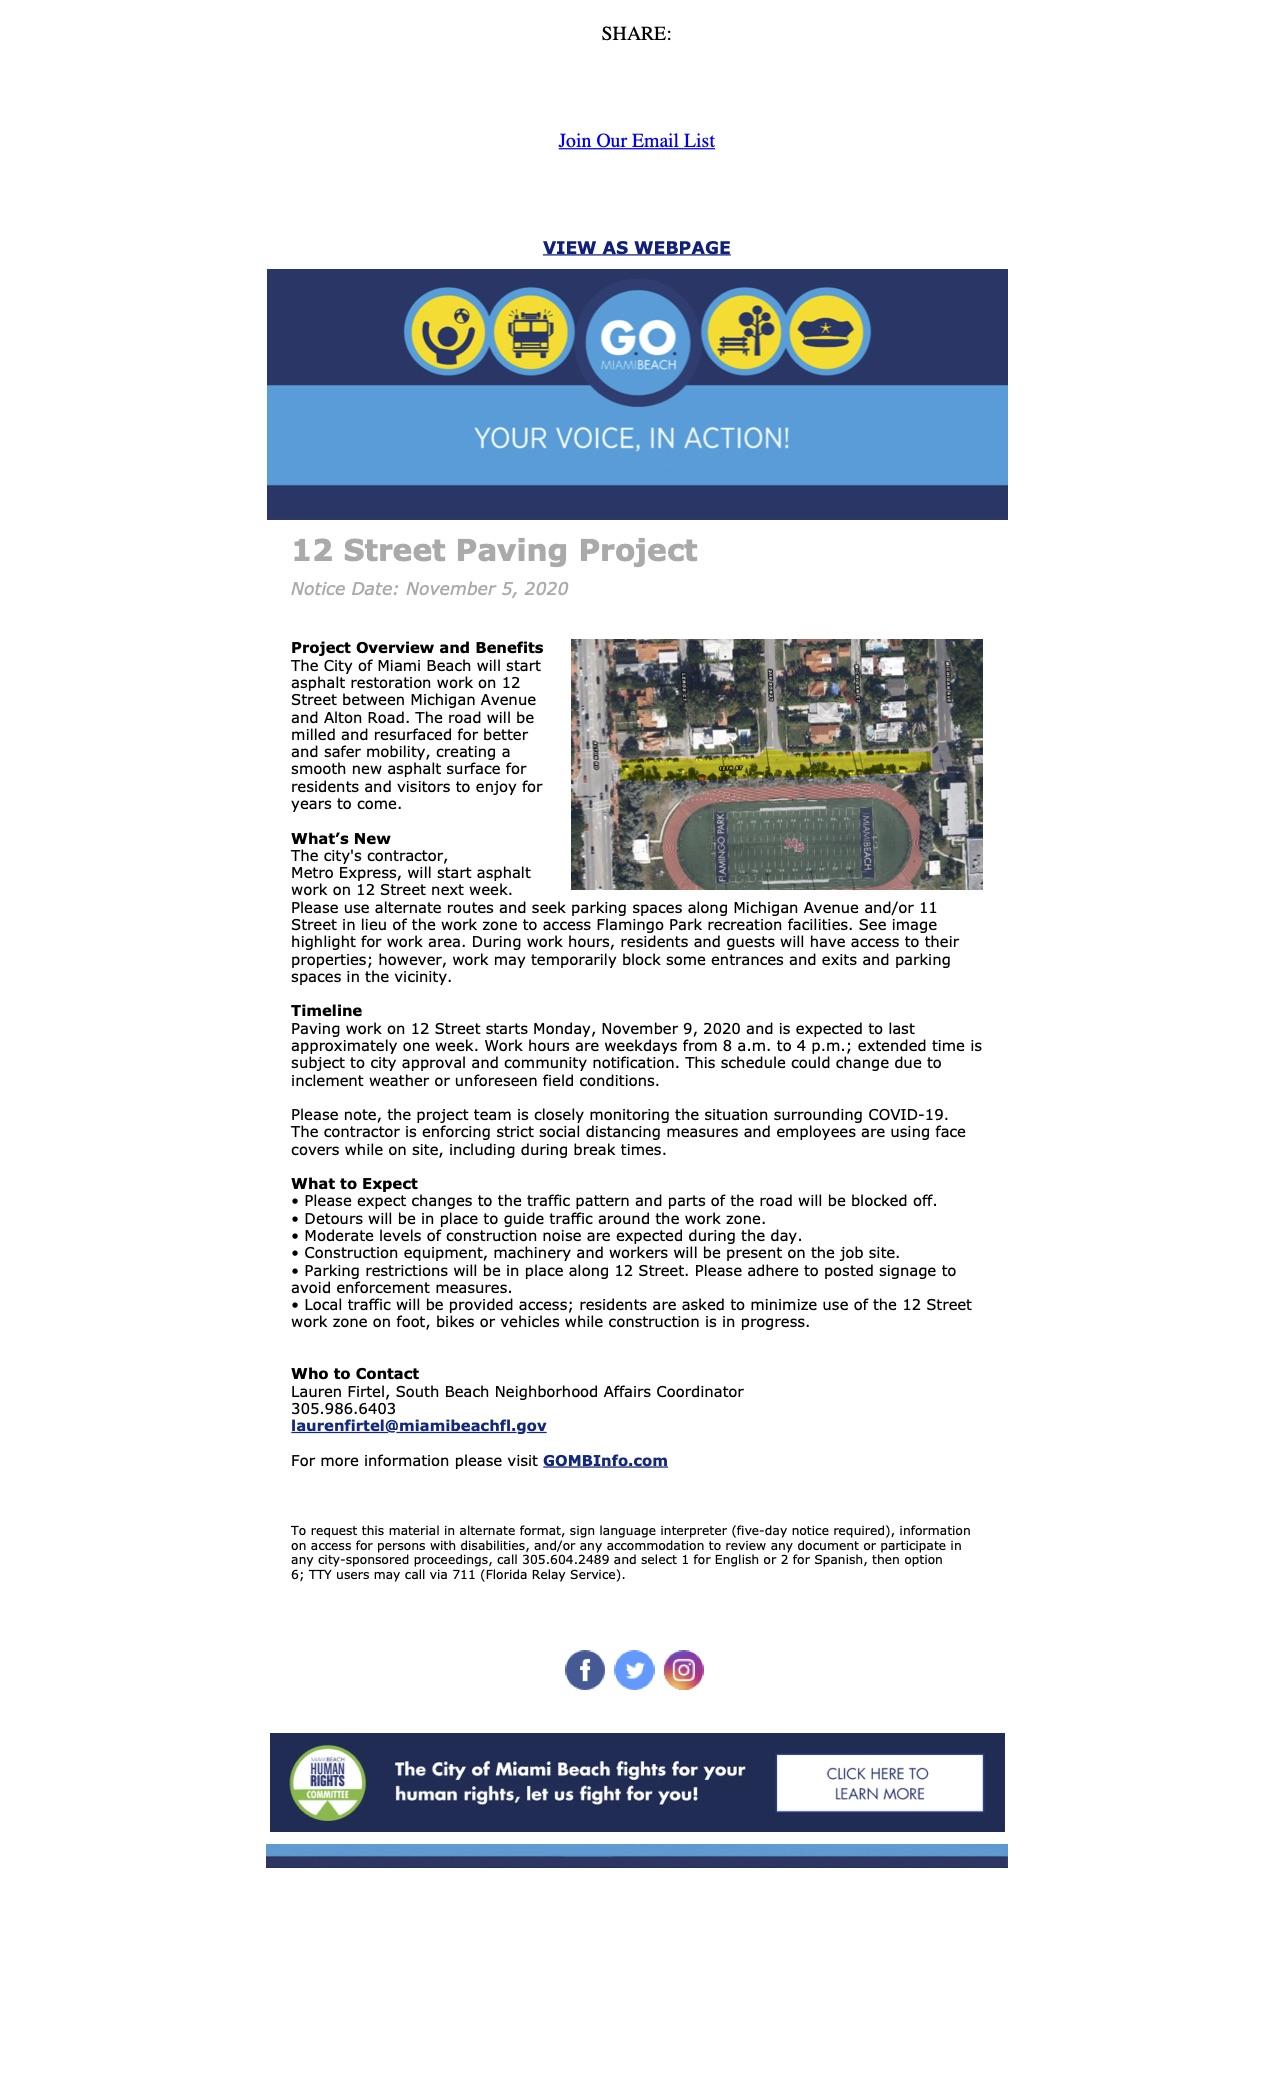 Construction Advisory_ 12 Street Paving starts next week!